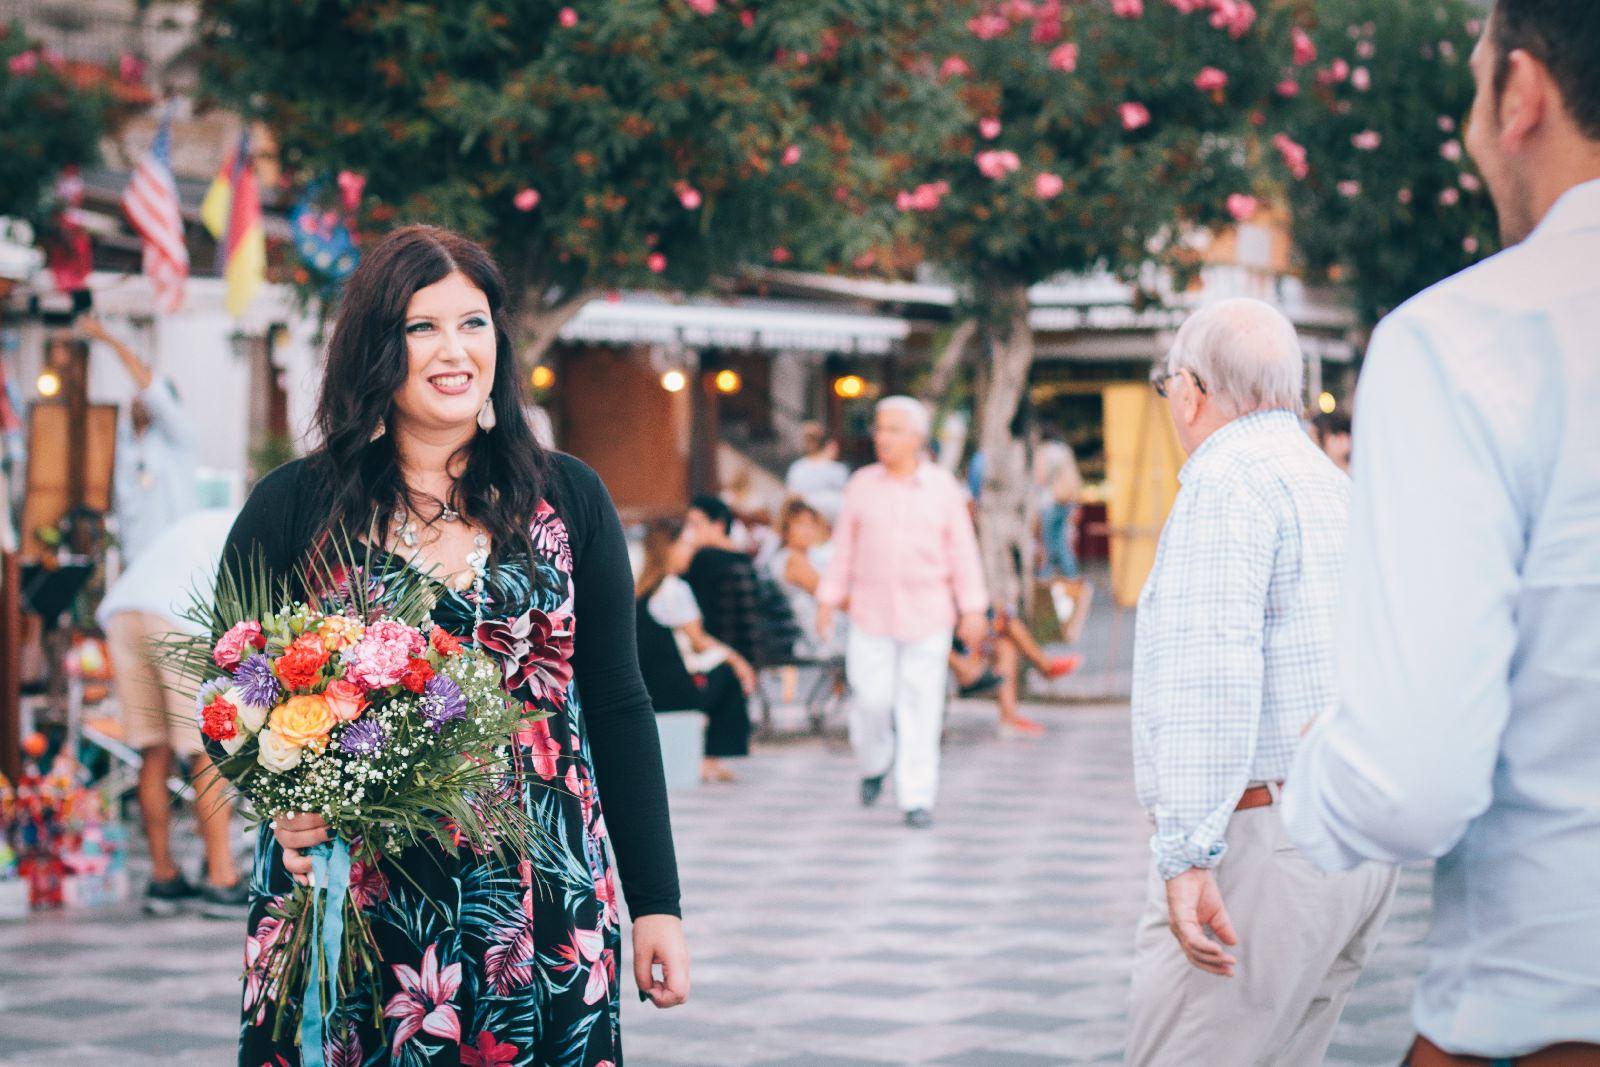 057-2018-09-22-Engagement-Alessandra-e-Igor-Pizzone-056